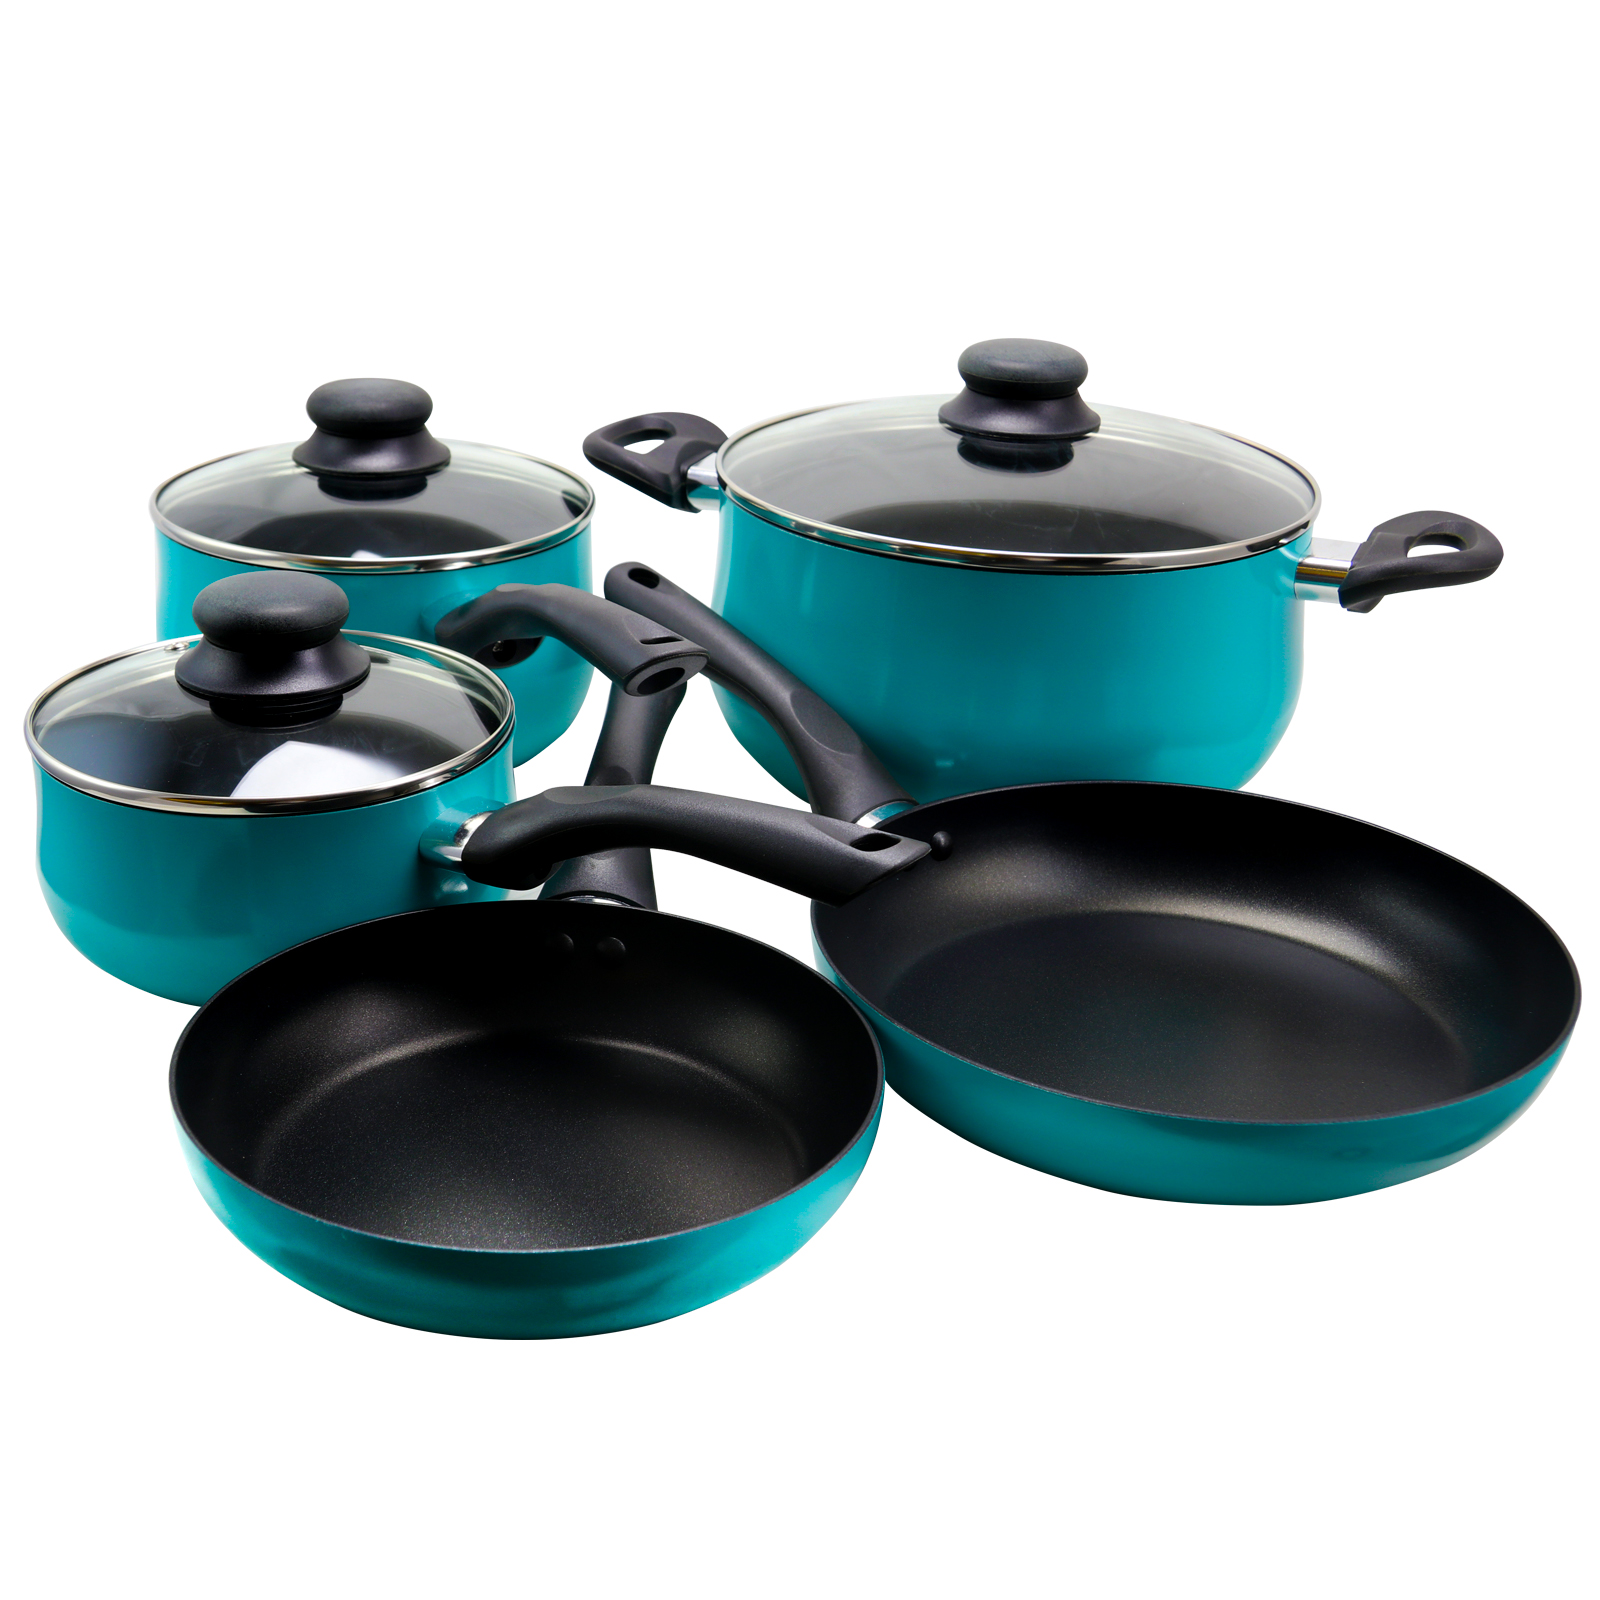 Sunbeam Reddick 8 Piece Belly Shape Cookware in Turquoise